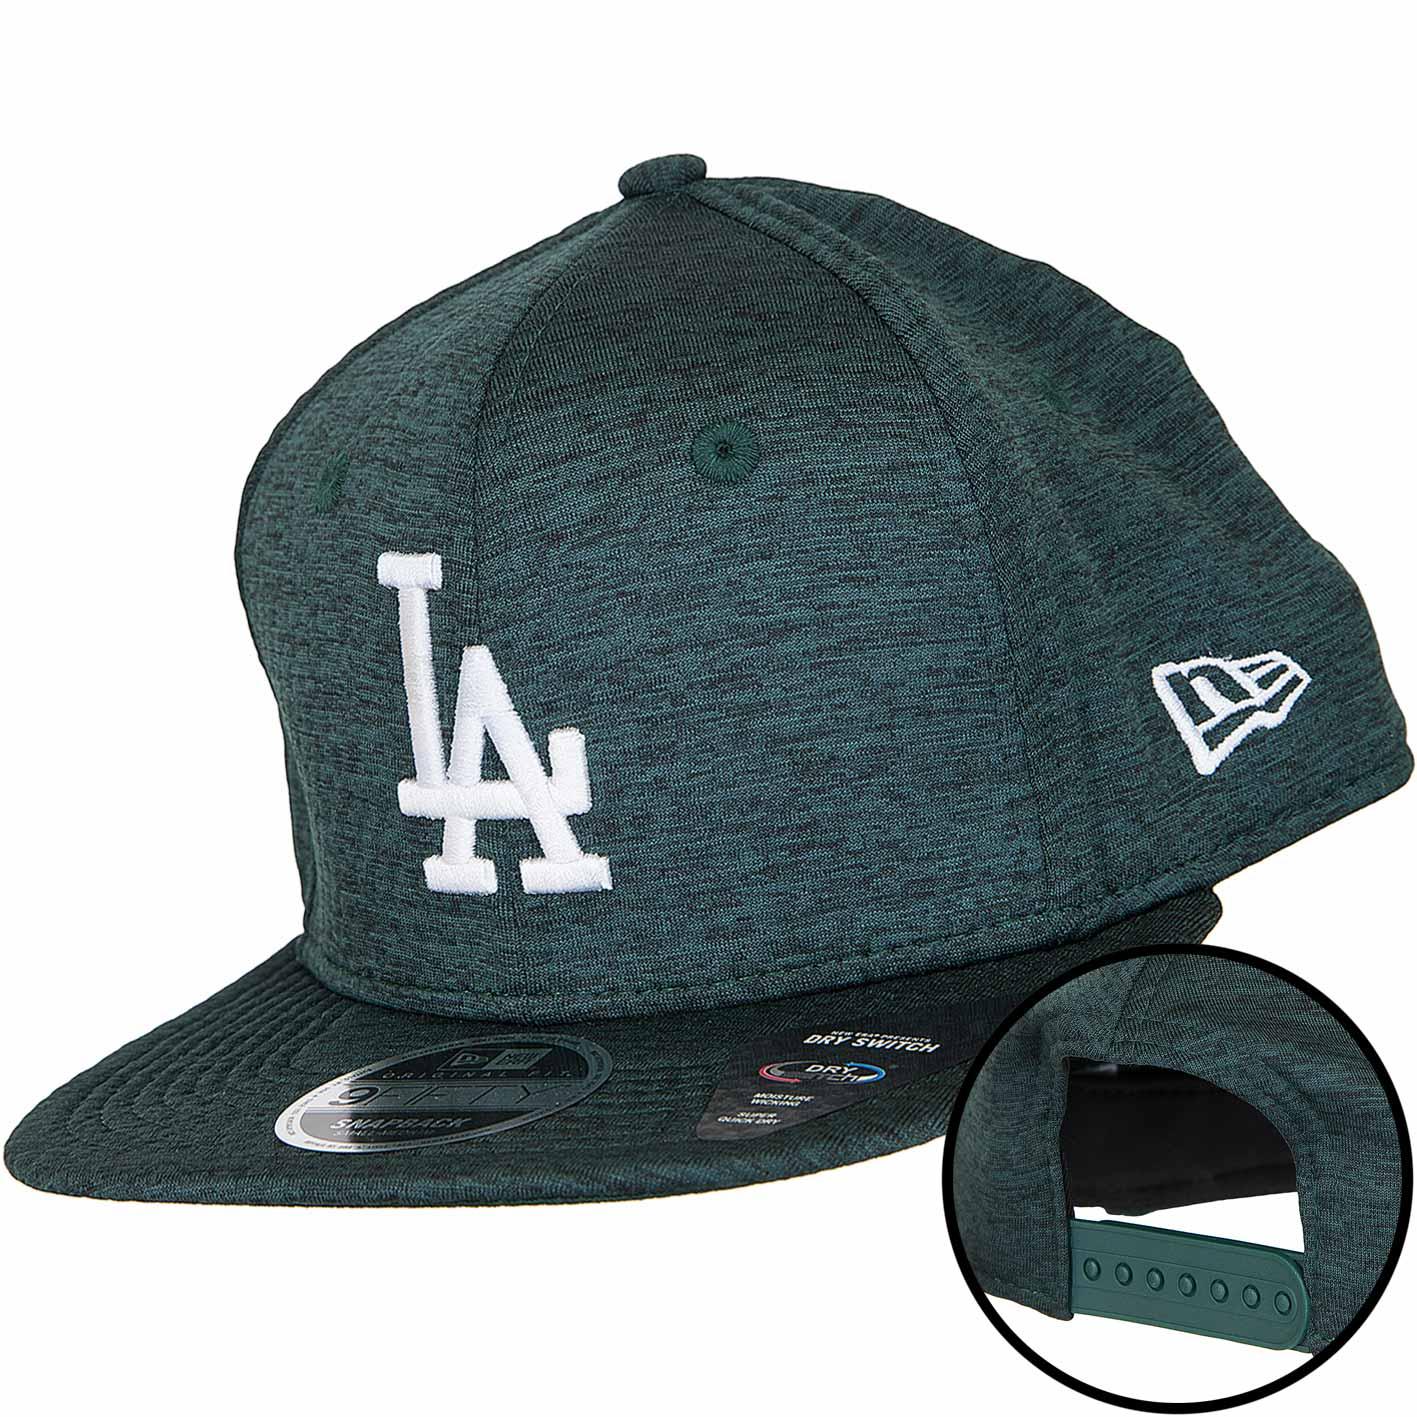 8299ac51ed8 ☆ New Era 9Fifty Snapback Cap Dry Switch L.A. Dodgers dunkelgrün ...